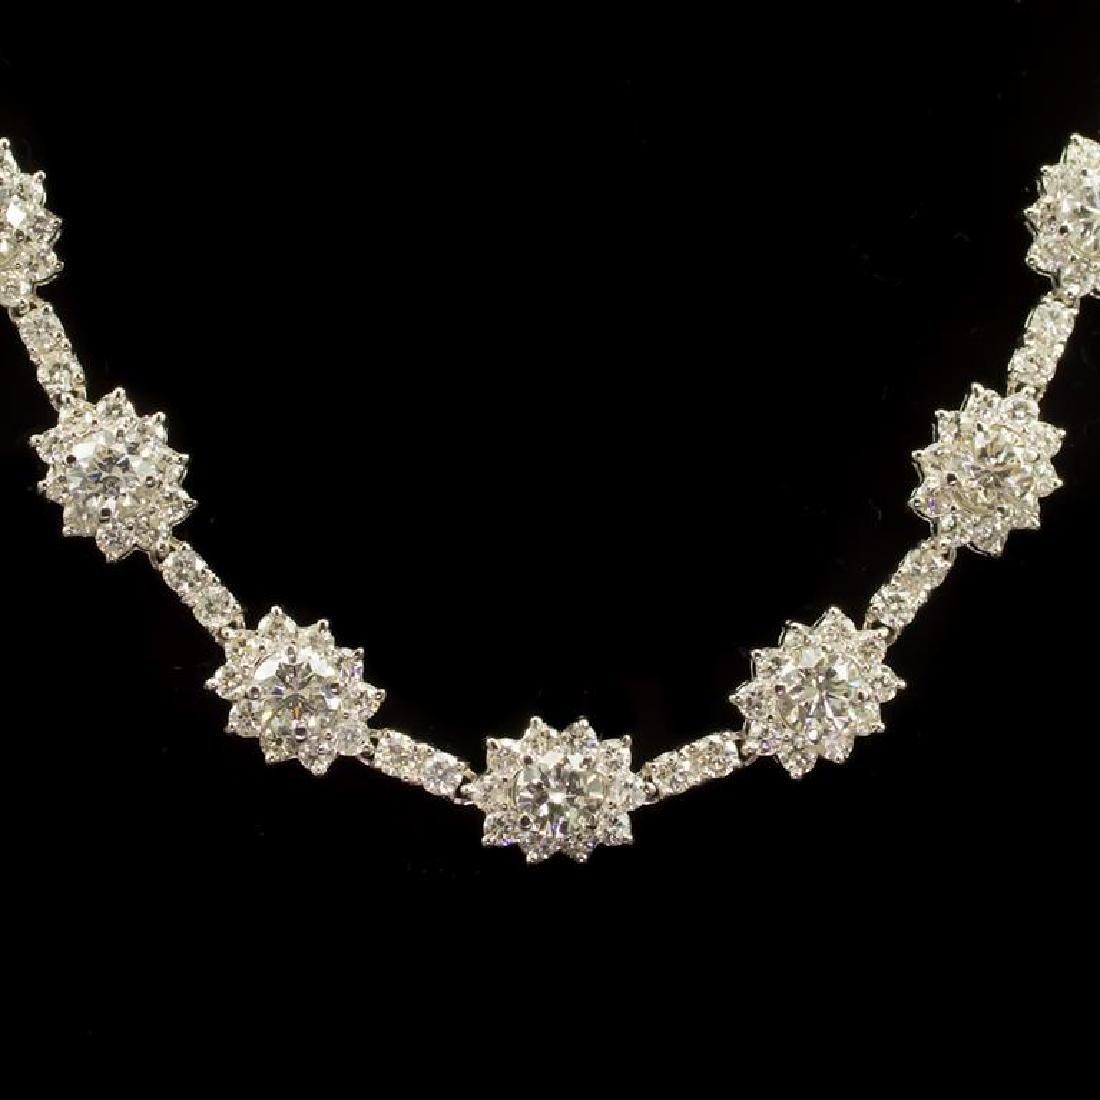 18K Gold 18.22ct Diamond Necklace